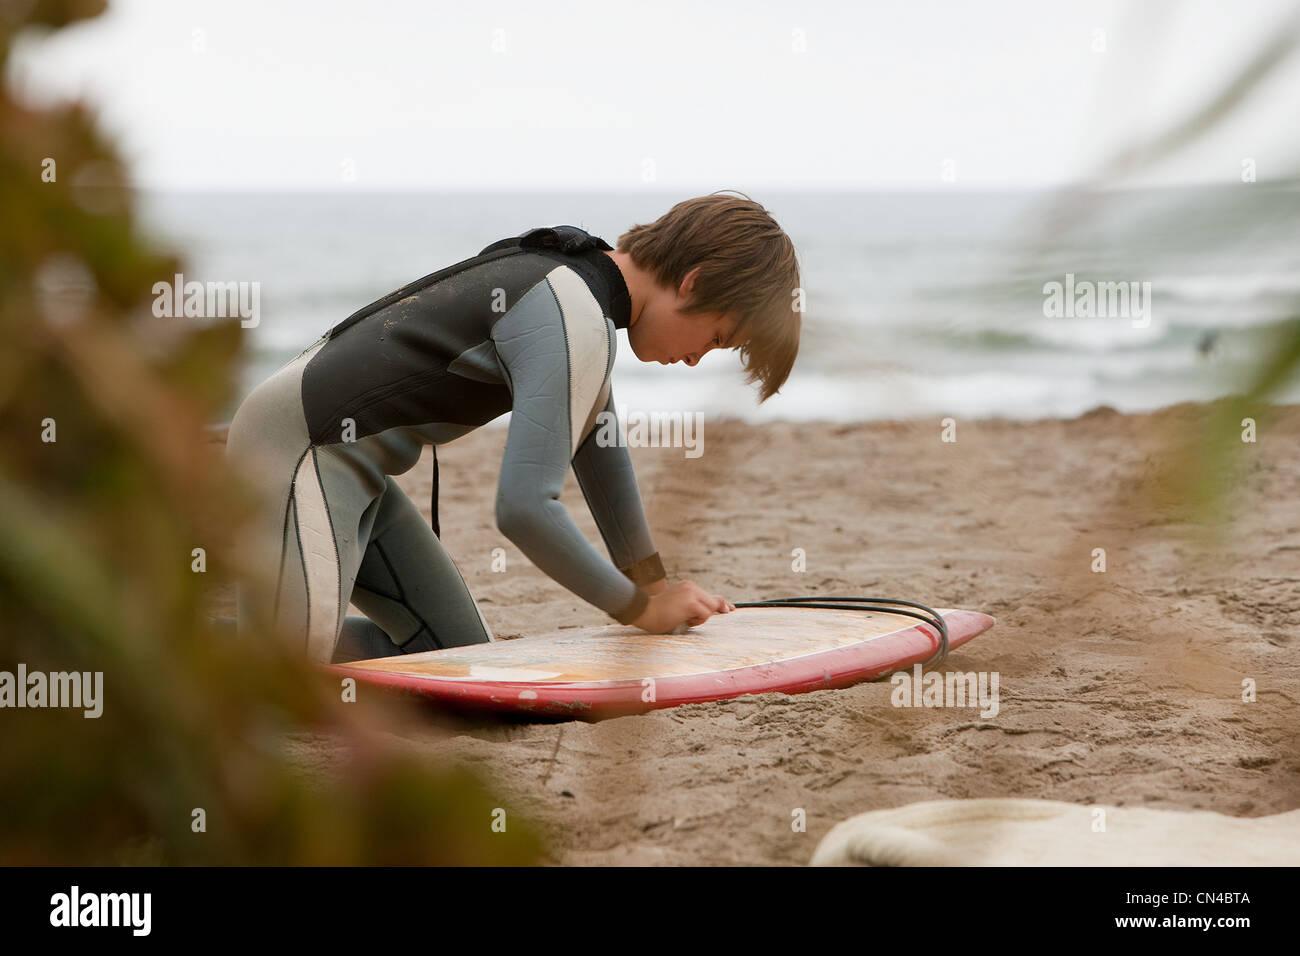 Boy waxing surfboard on beach - Stock Image